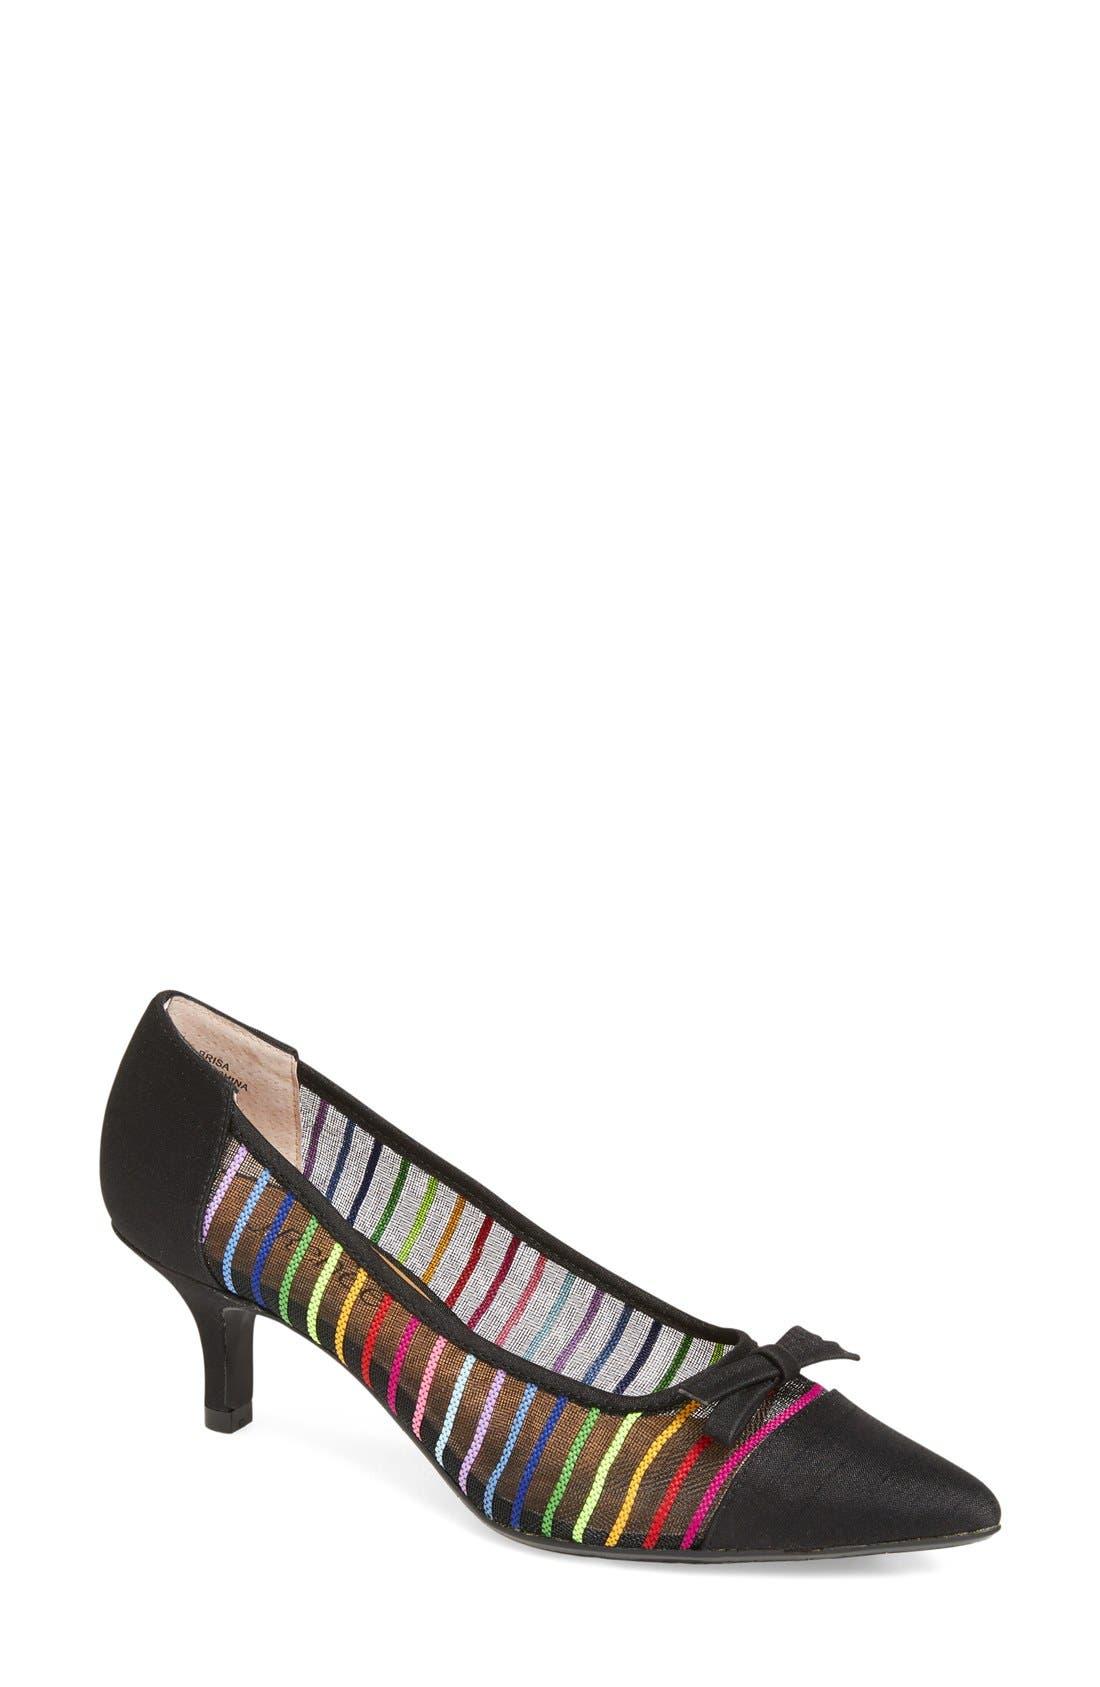 J. Reneé Brisa Pointy Toe Rainbow Stripe Pump (Women)